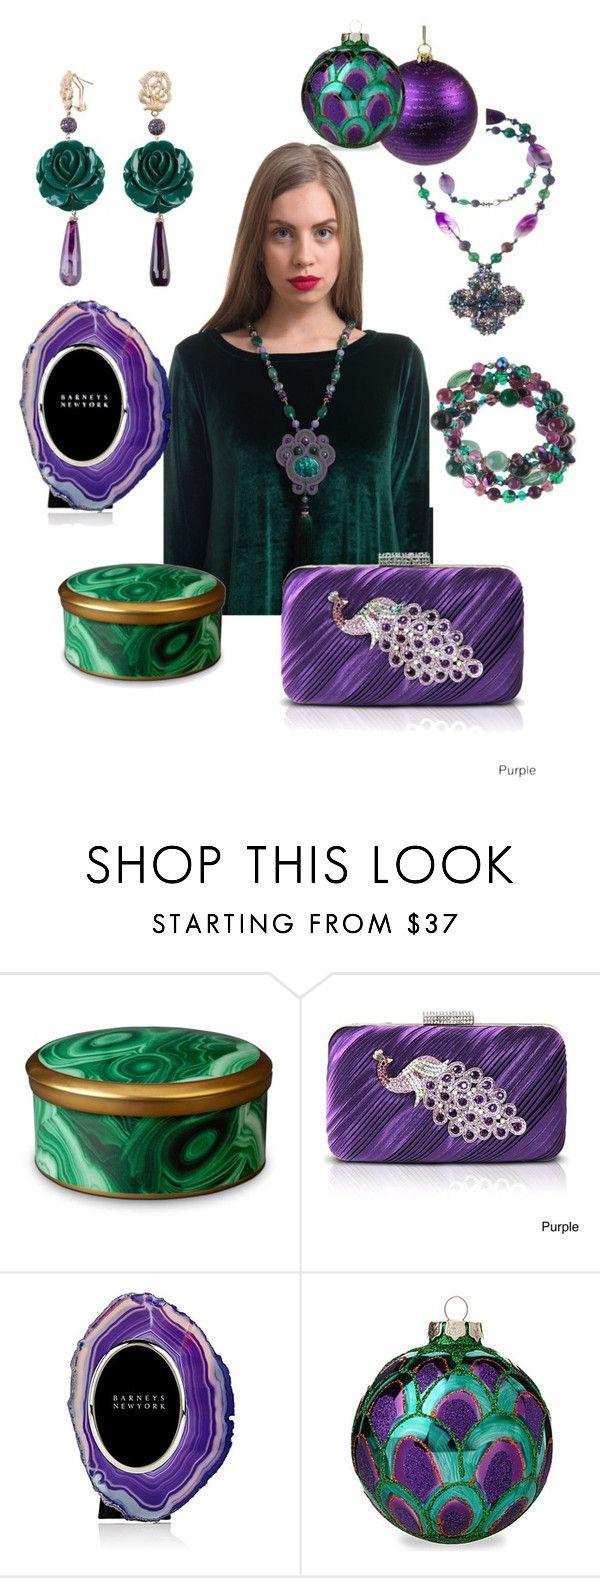 """Turandot collection from Yaroslavna.com"" by yaroslavna-dobryanskaya ❤ liked on Polyvore featuring L'Objet, Jacki Design and Anna New York"